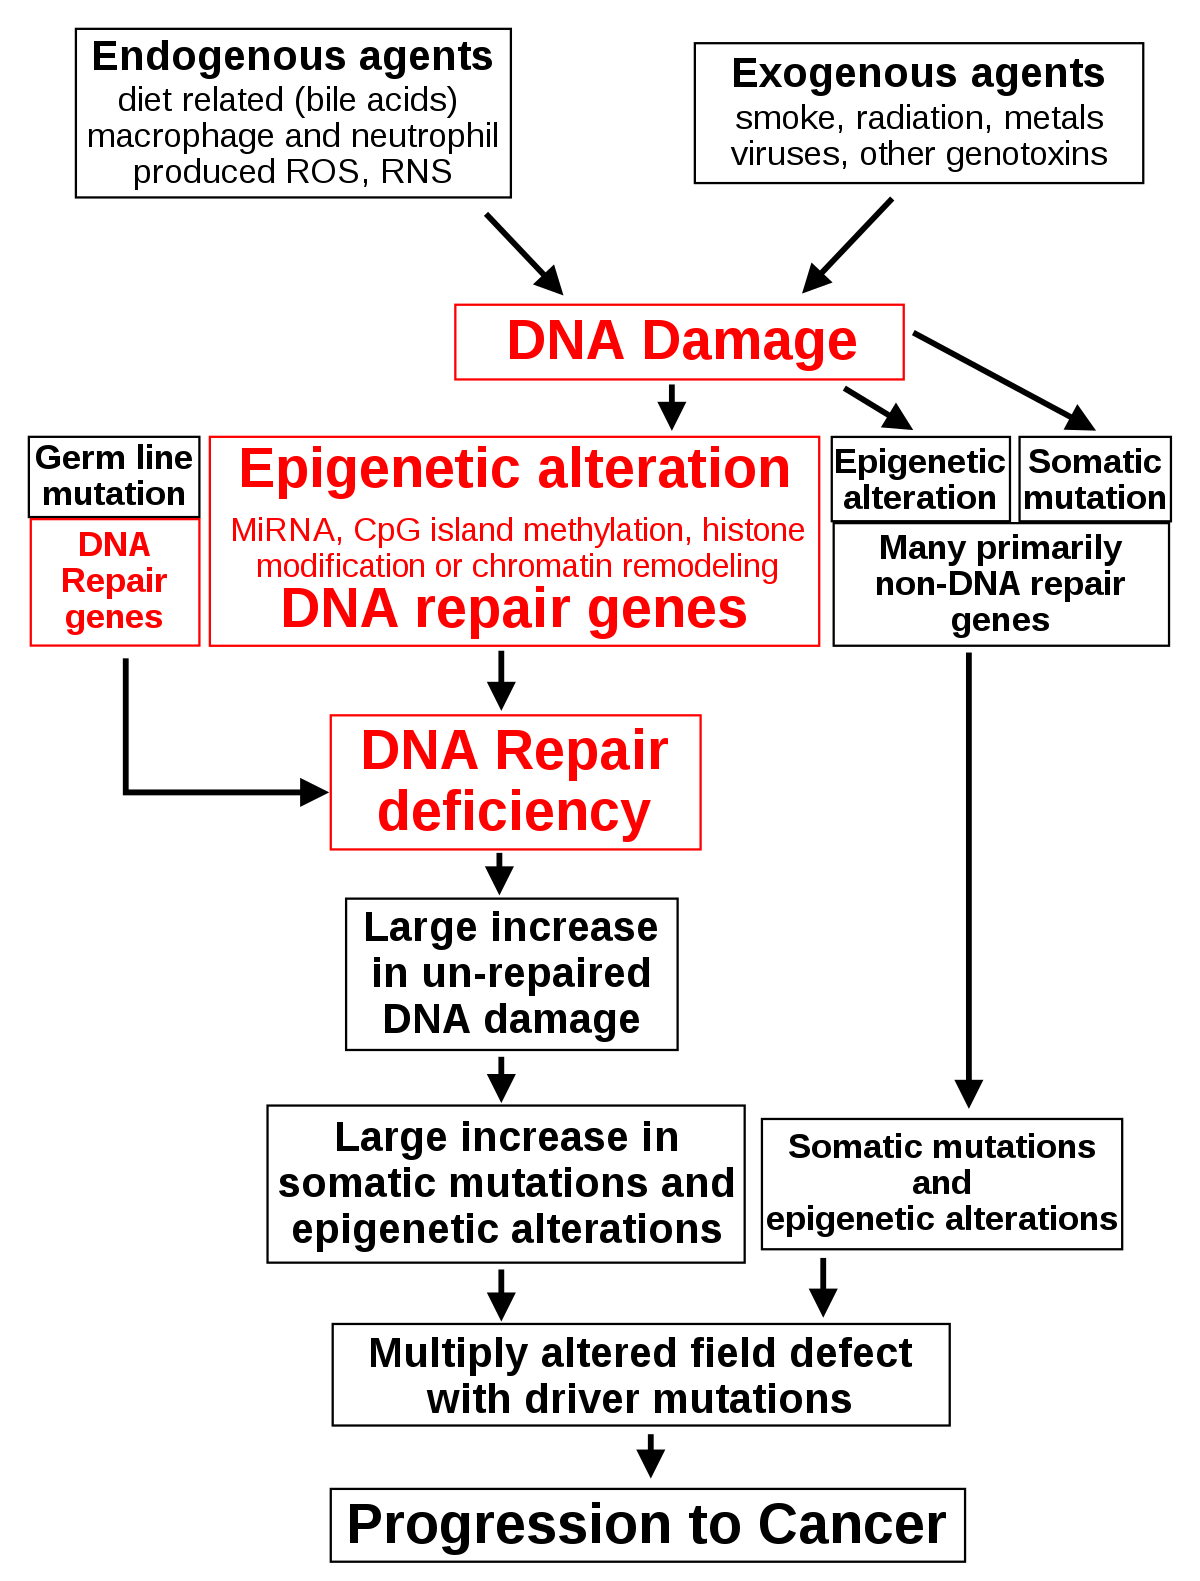 endometrium rák tumor markerek